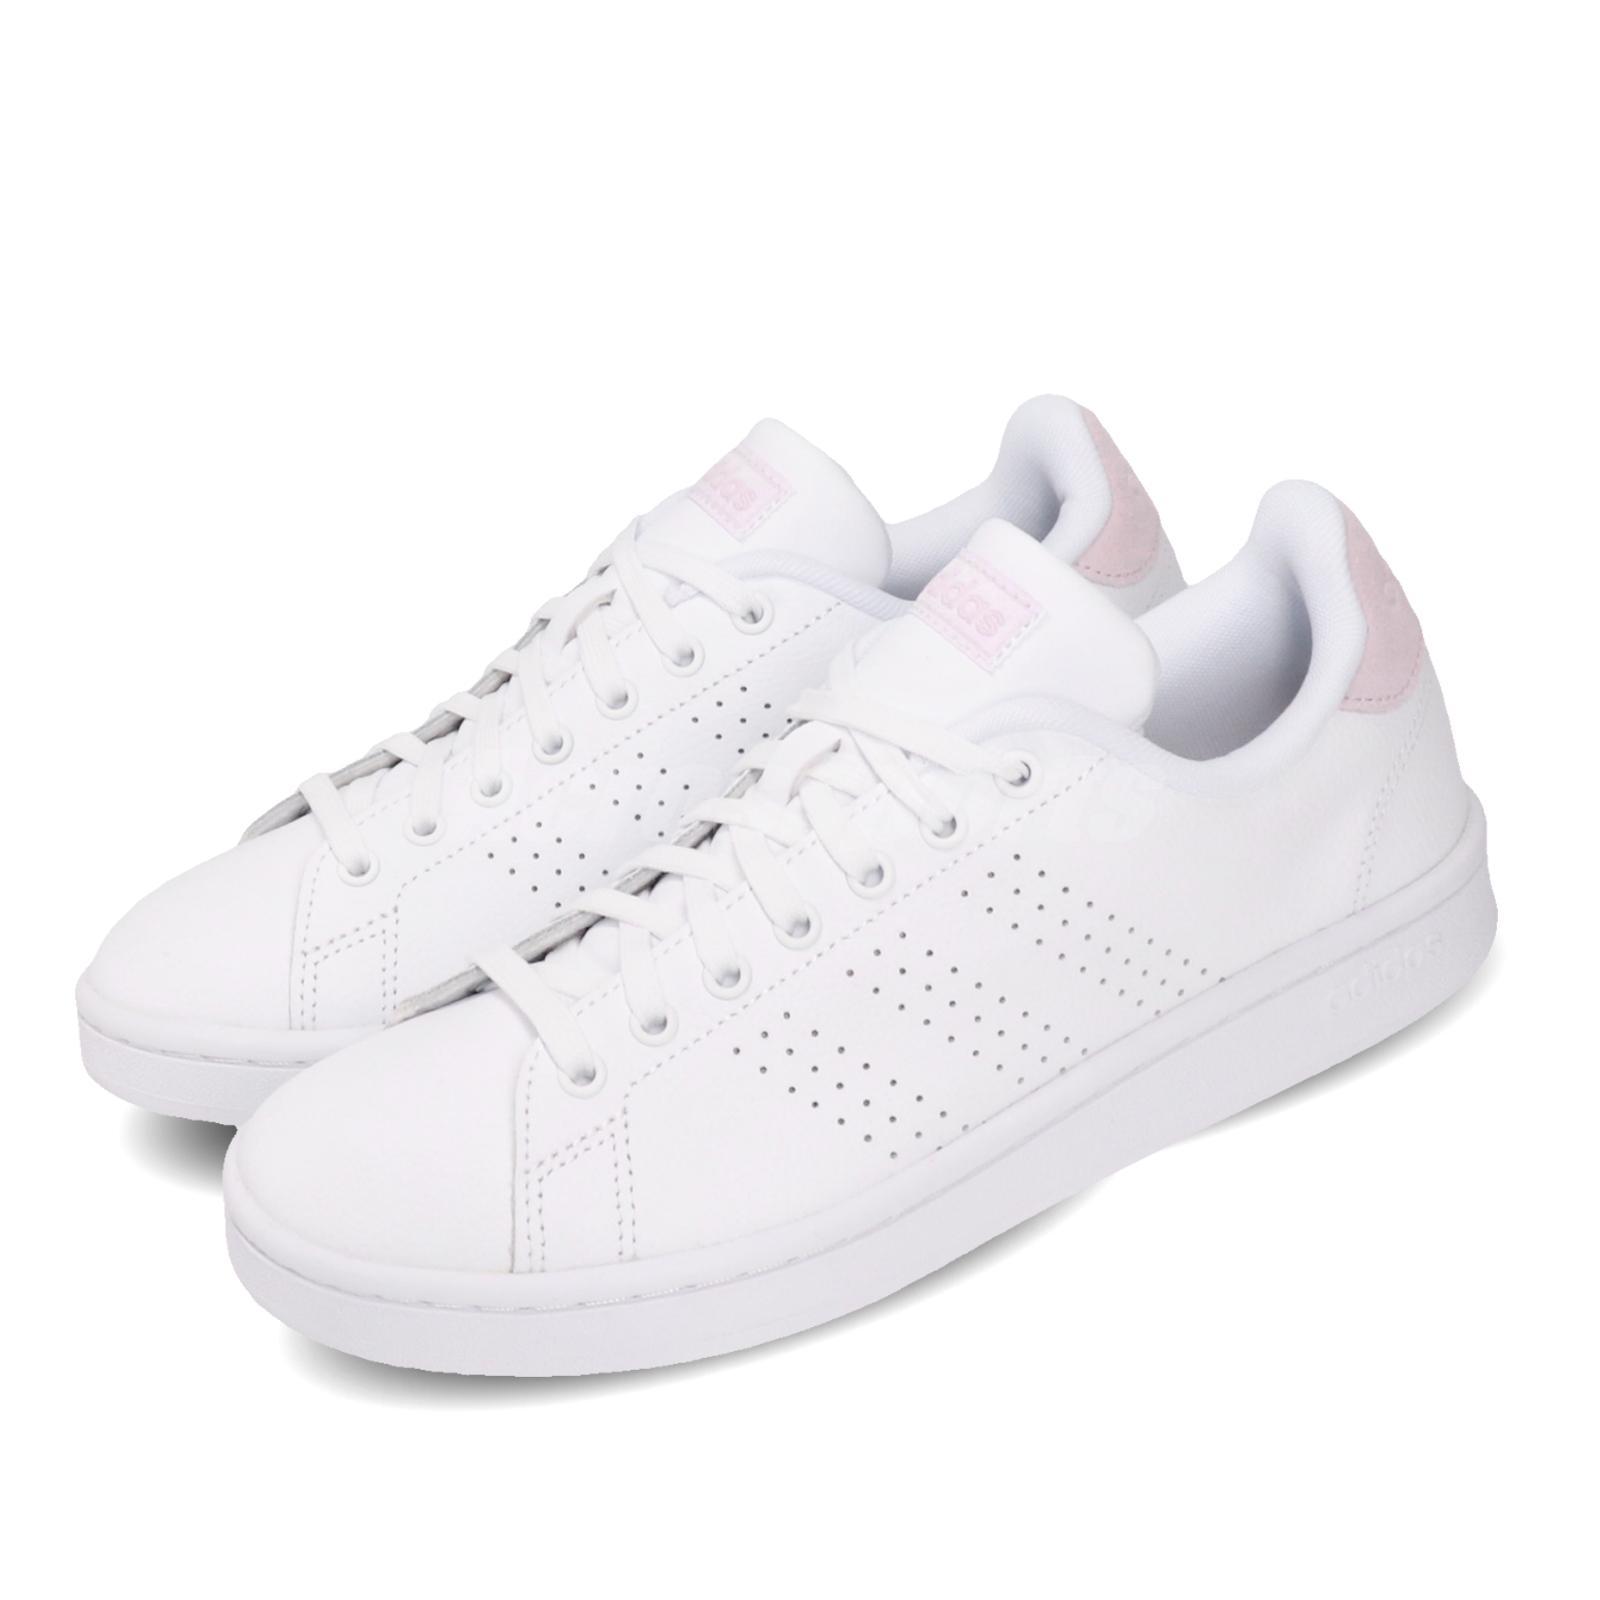 adidas Advantage White Pink Women